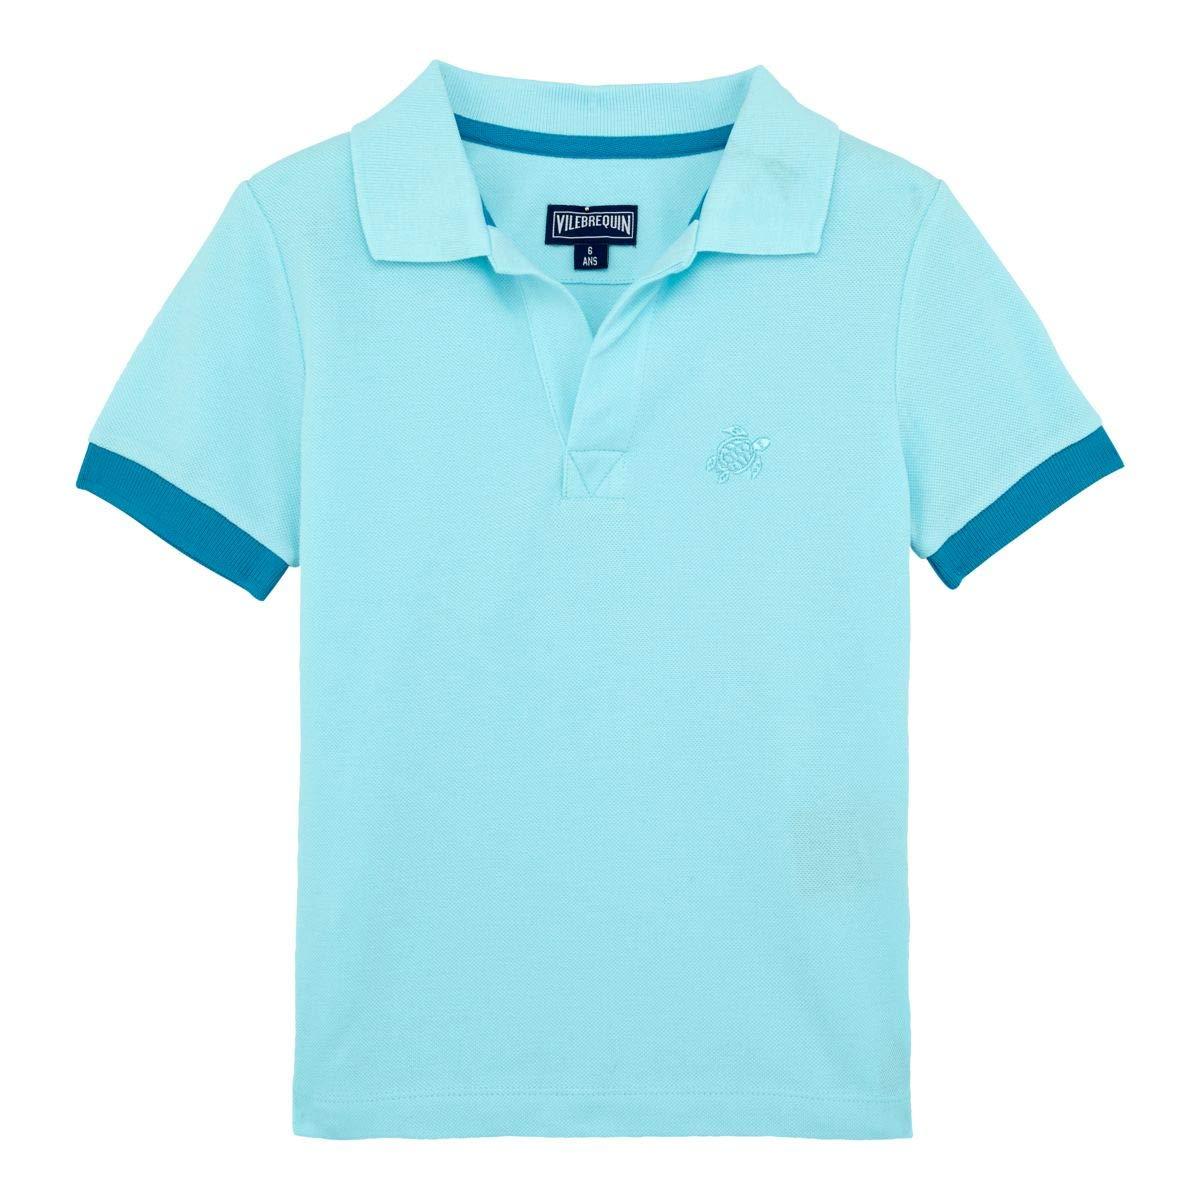 Vilebrequin Boys' Big Kids Cotton Pique Polo-10 yrs, Aquamarine, 10